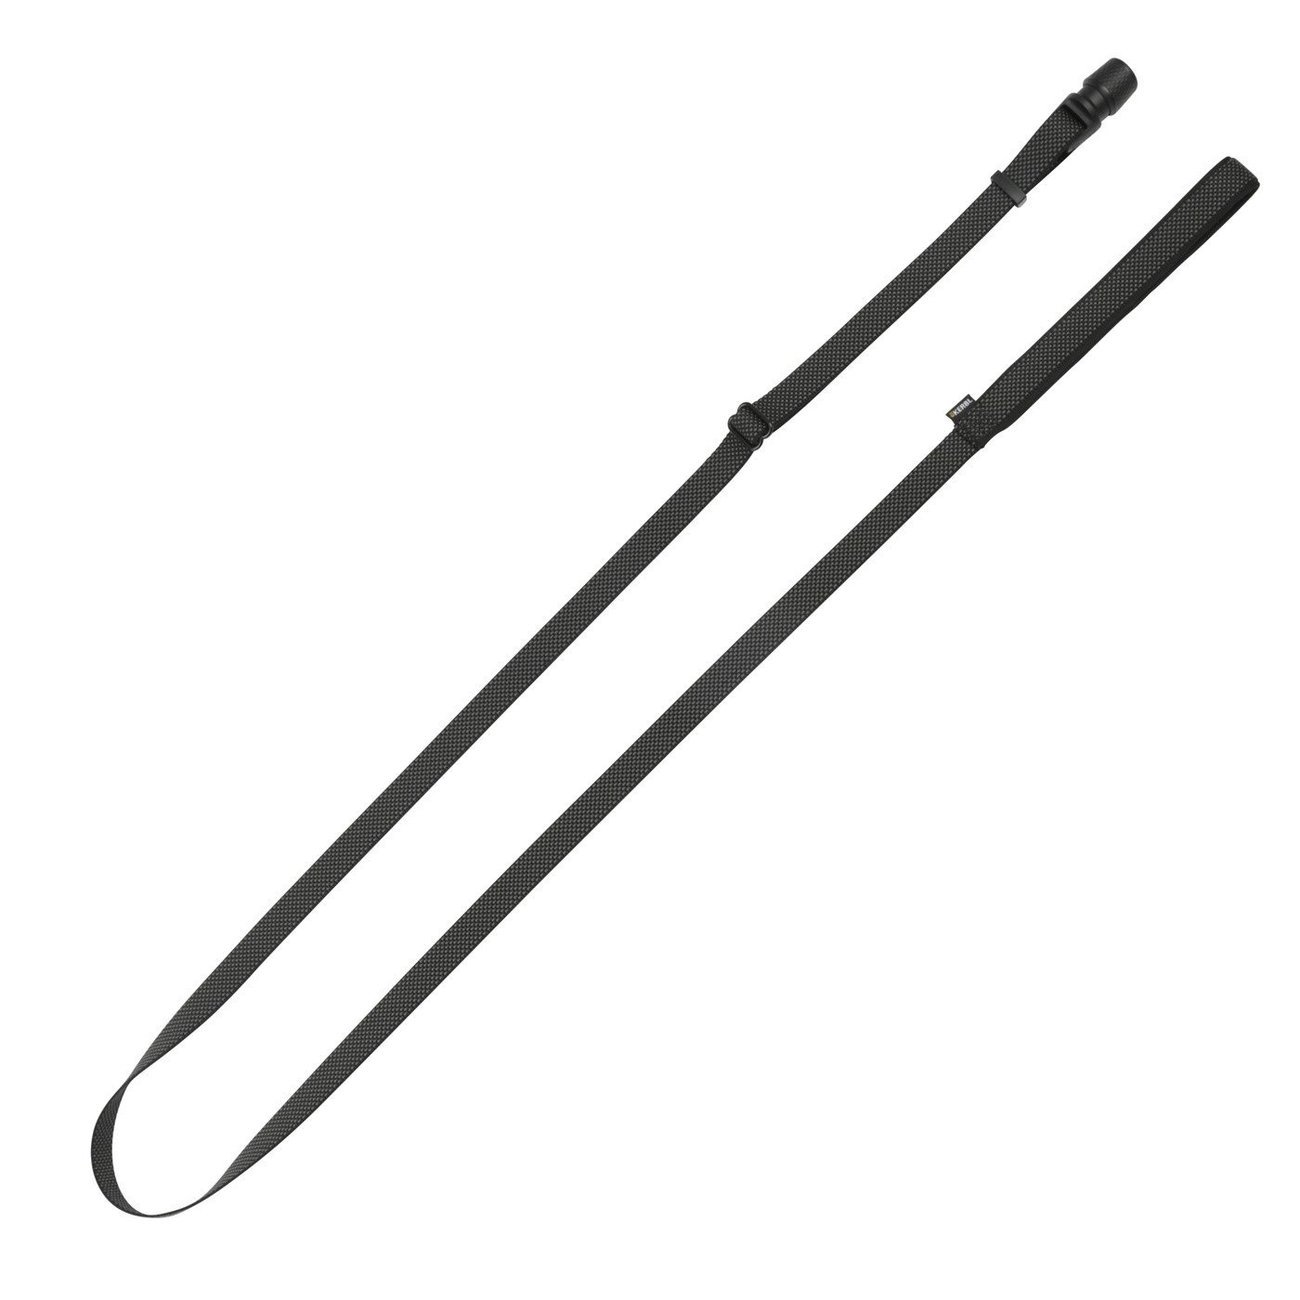 Hundeleine Flat GoLeyGo 2.0, schwarz, 20mm x 140-200cm